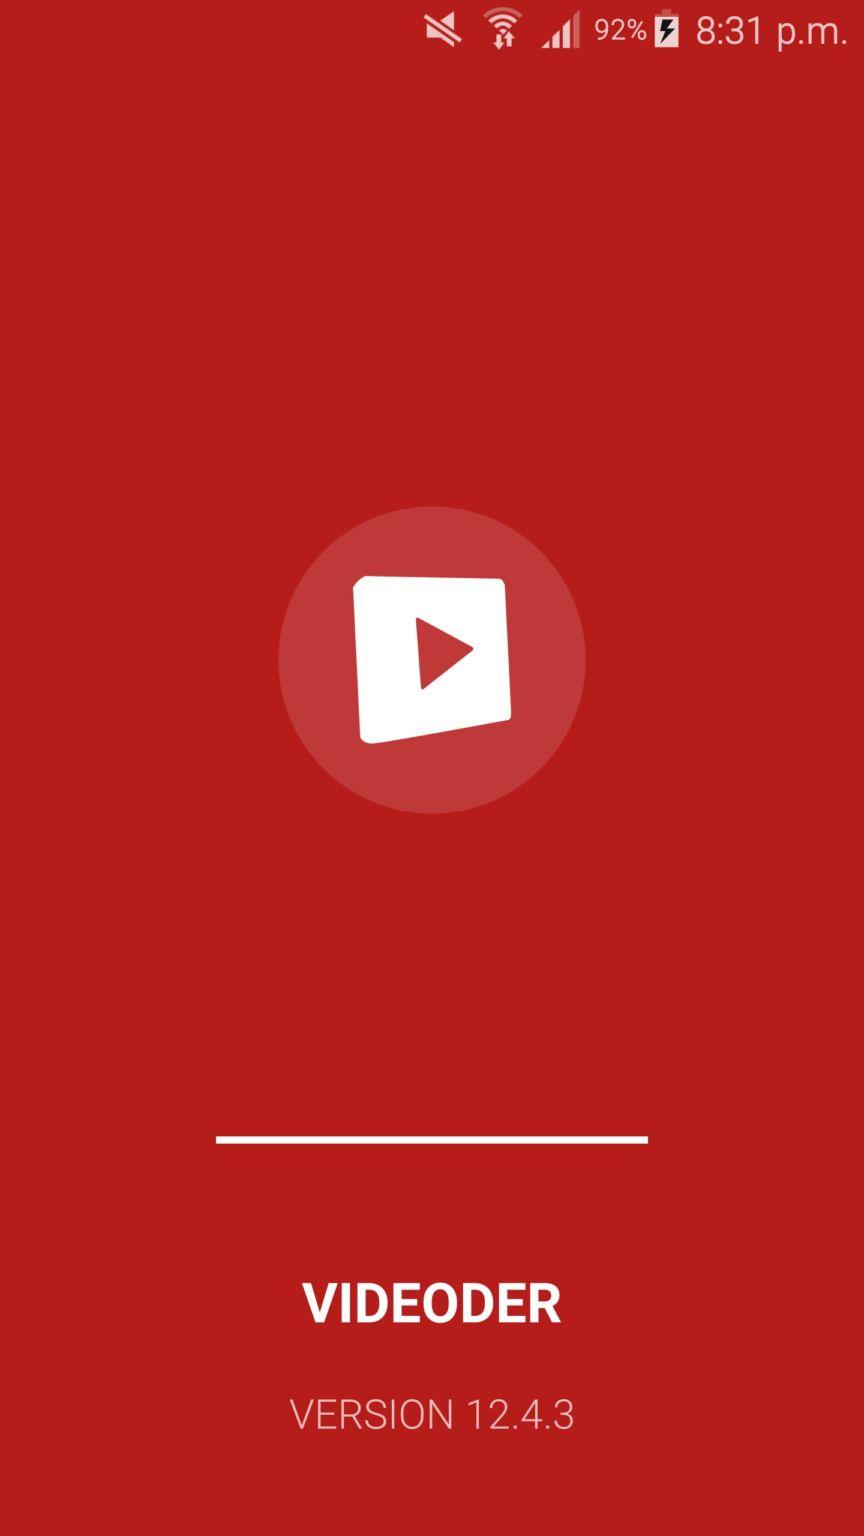 videoder premium apk free download